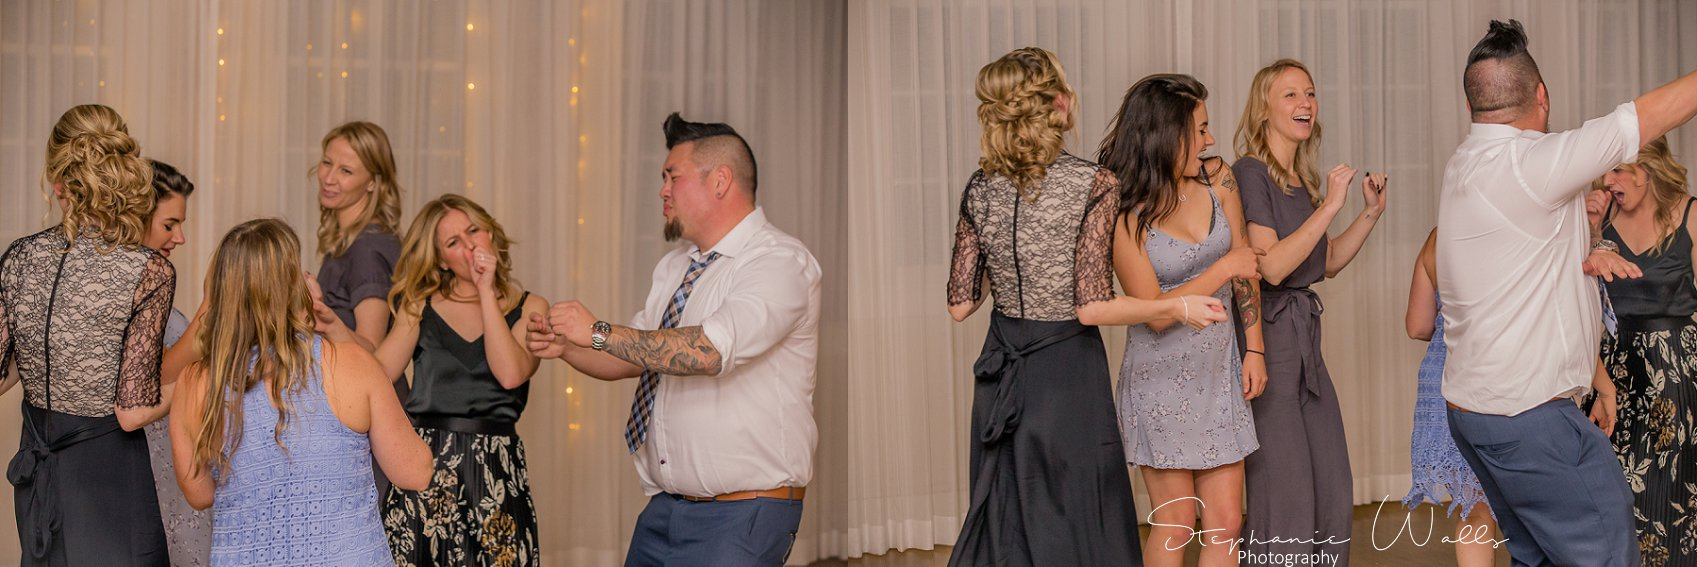 1st Dance Dancing 120 KK & Zack   Hollywood Schoolhouse Wedding   Woodinville, Wa Wedding Photographer